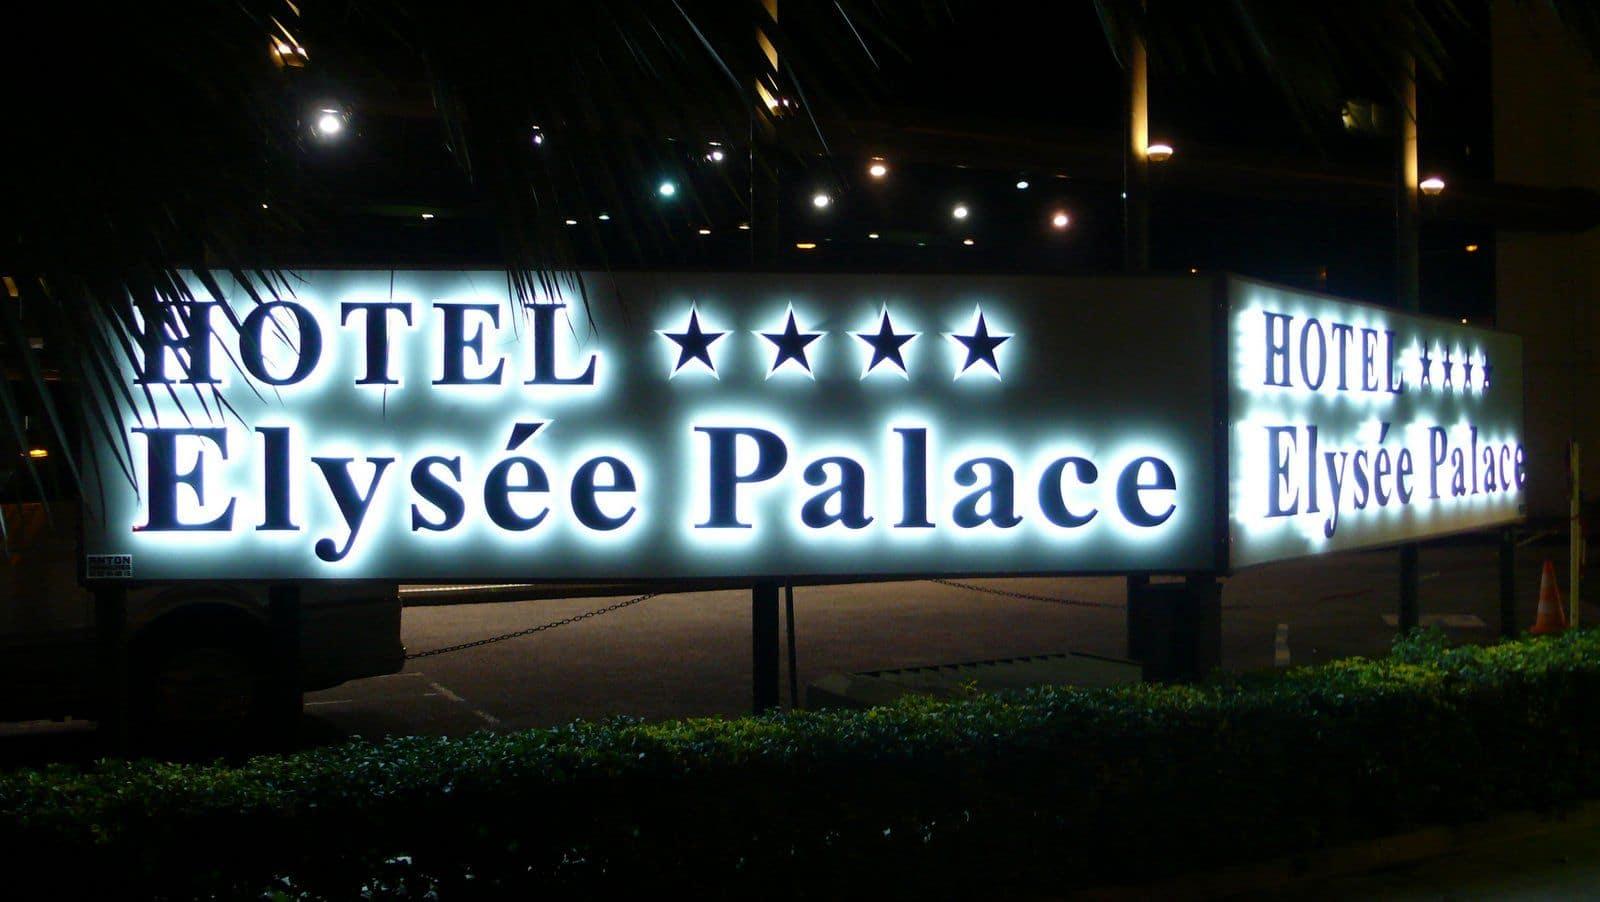 enseigne-hotels-nice-elysee-palace